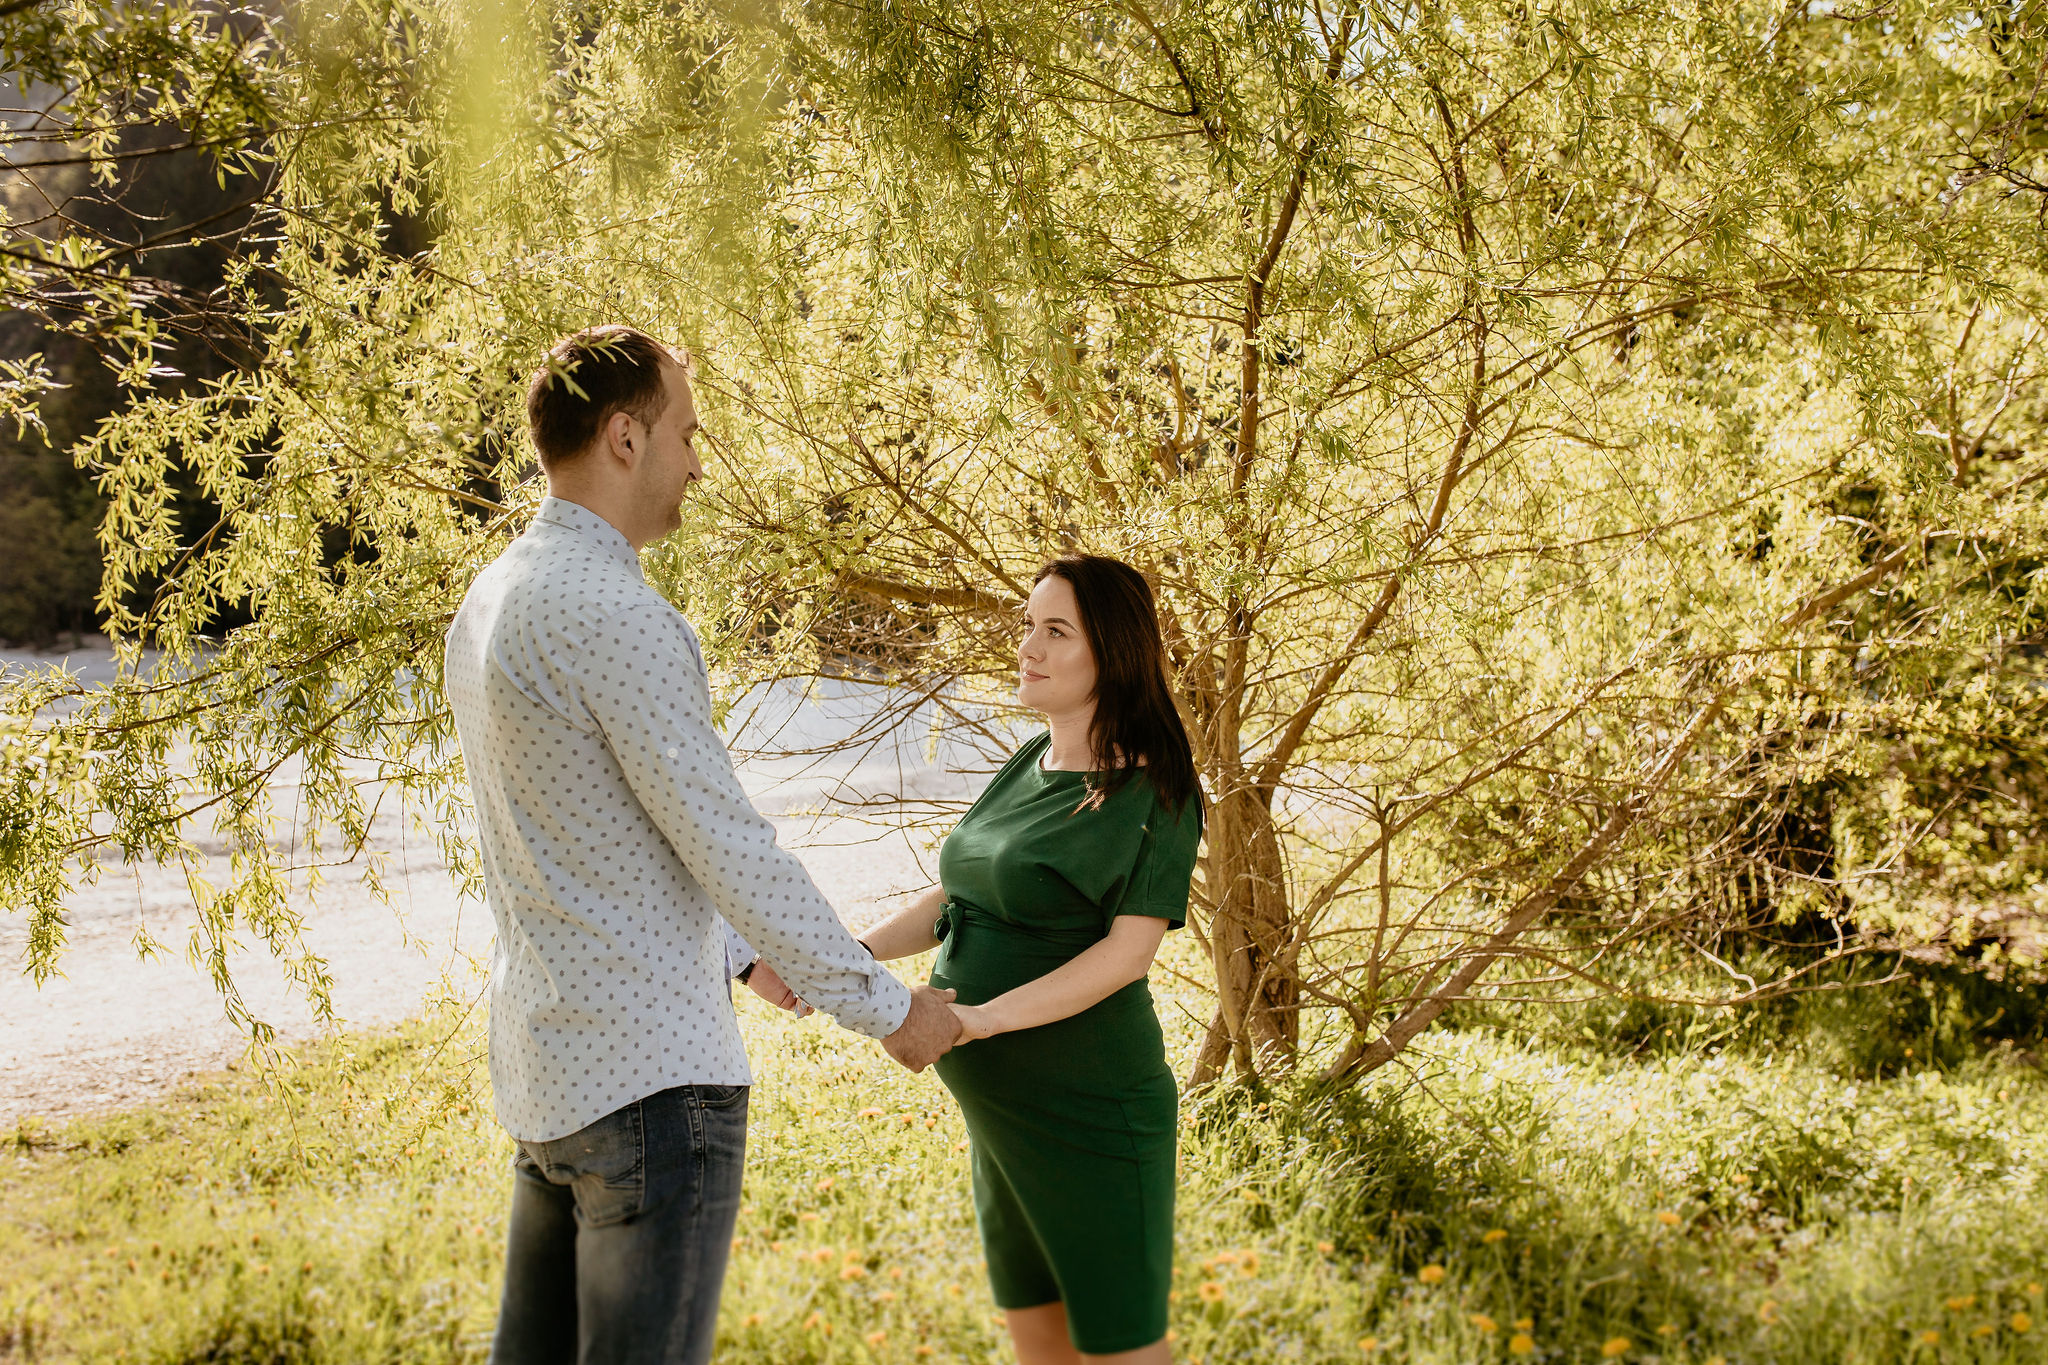 Nosecnica S - Luanina pravljica, fotografiranje nosecnic, novorojenckov, malckov, druzinic, cake smash fotografija 004